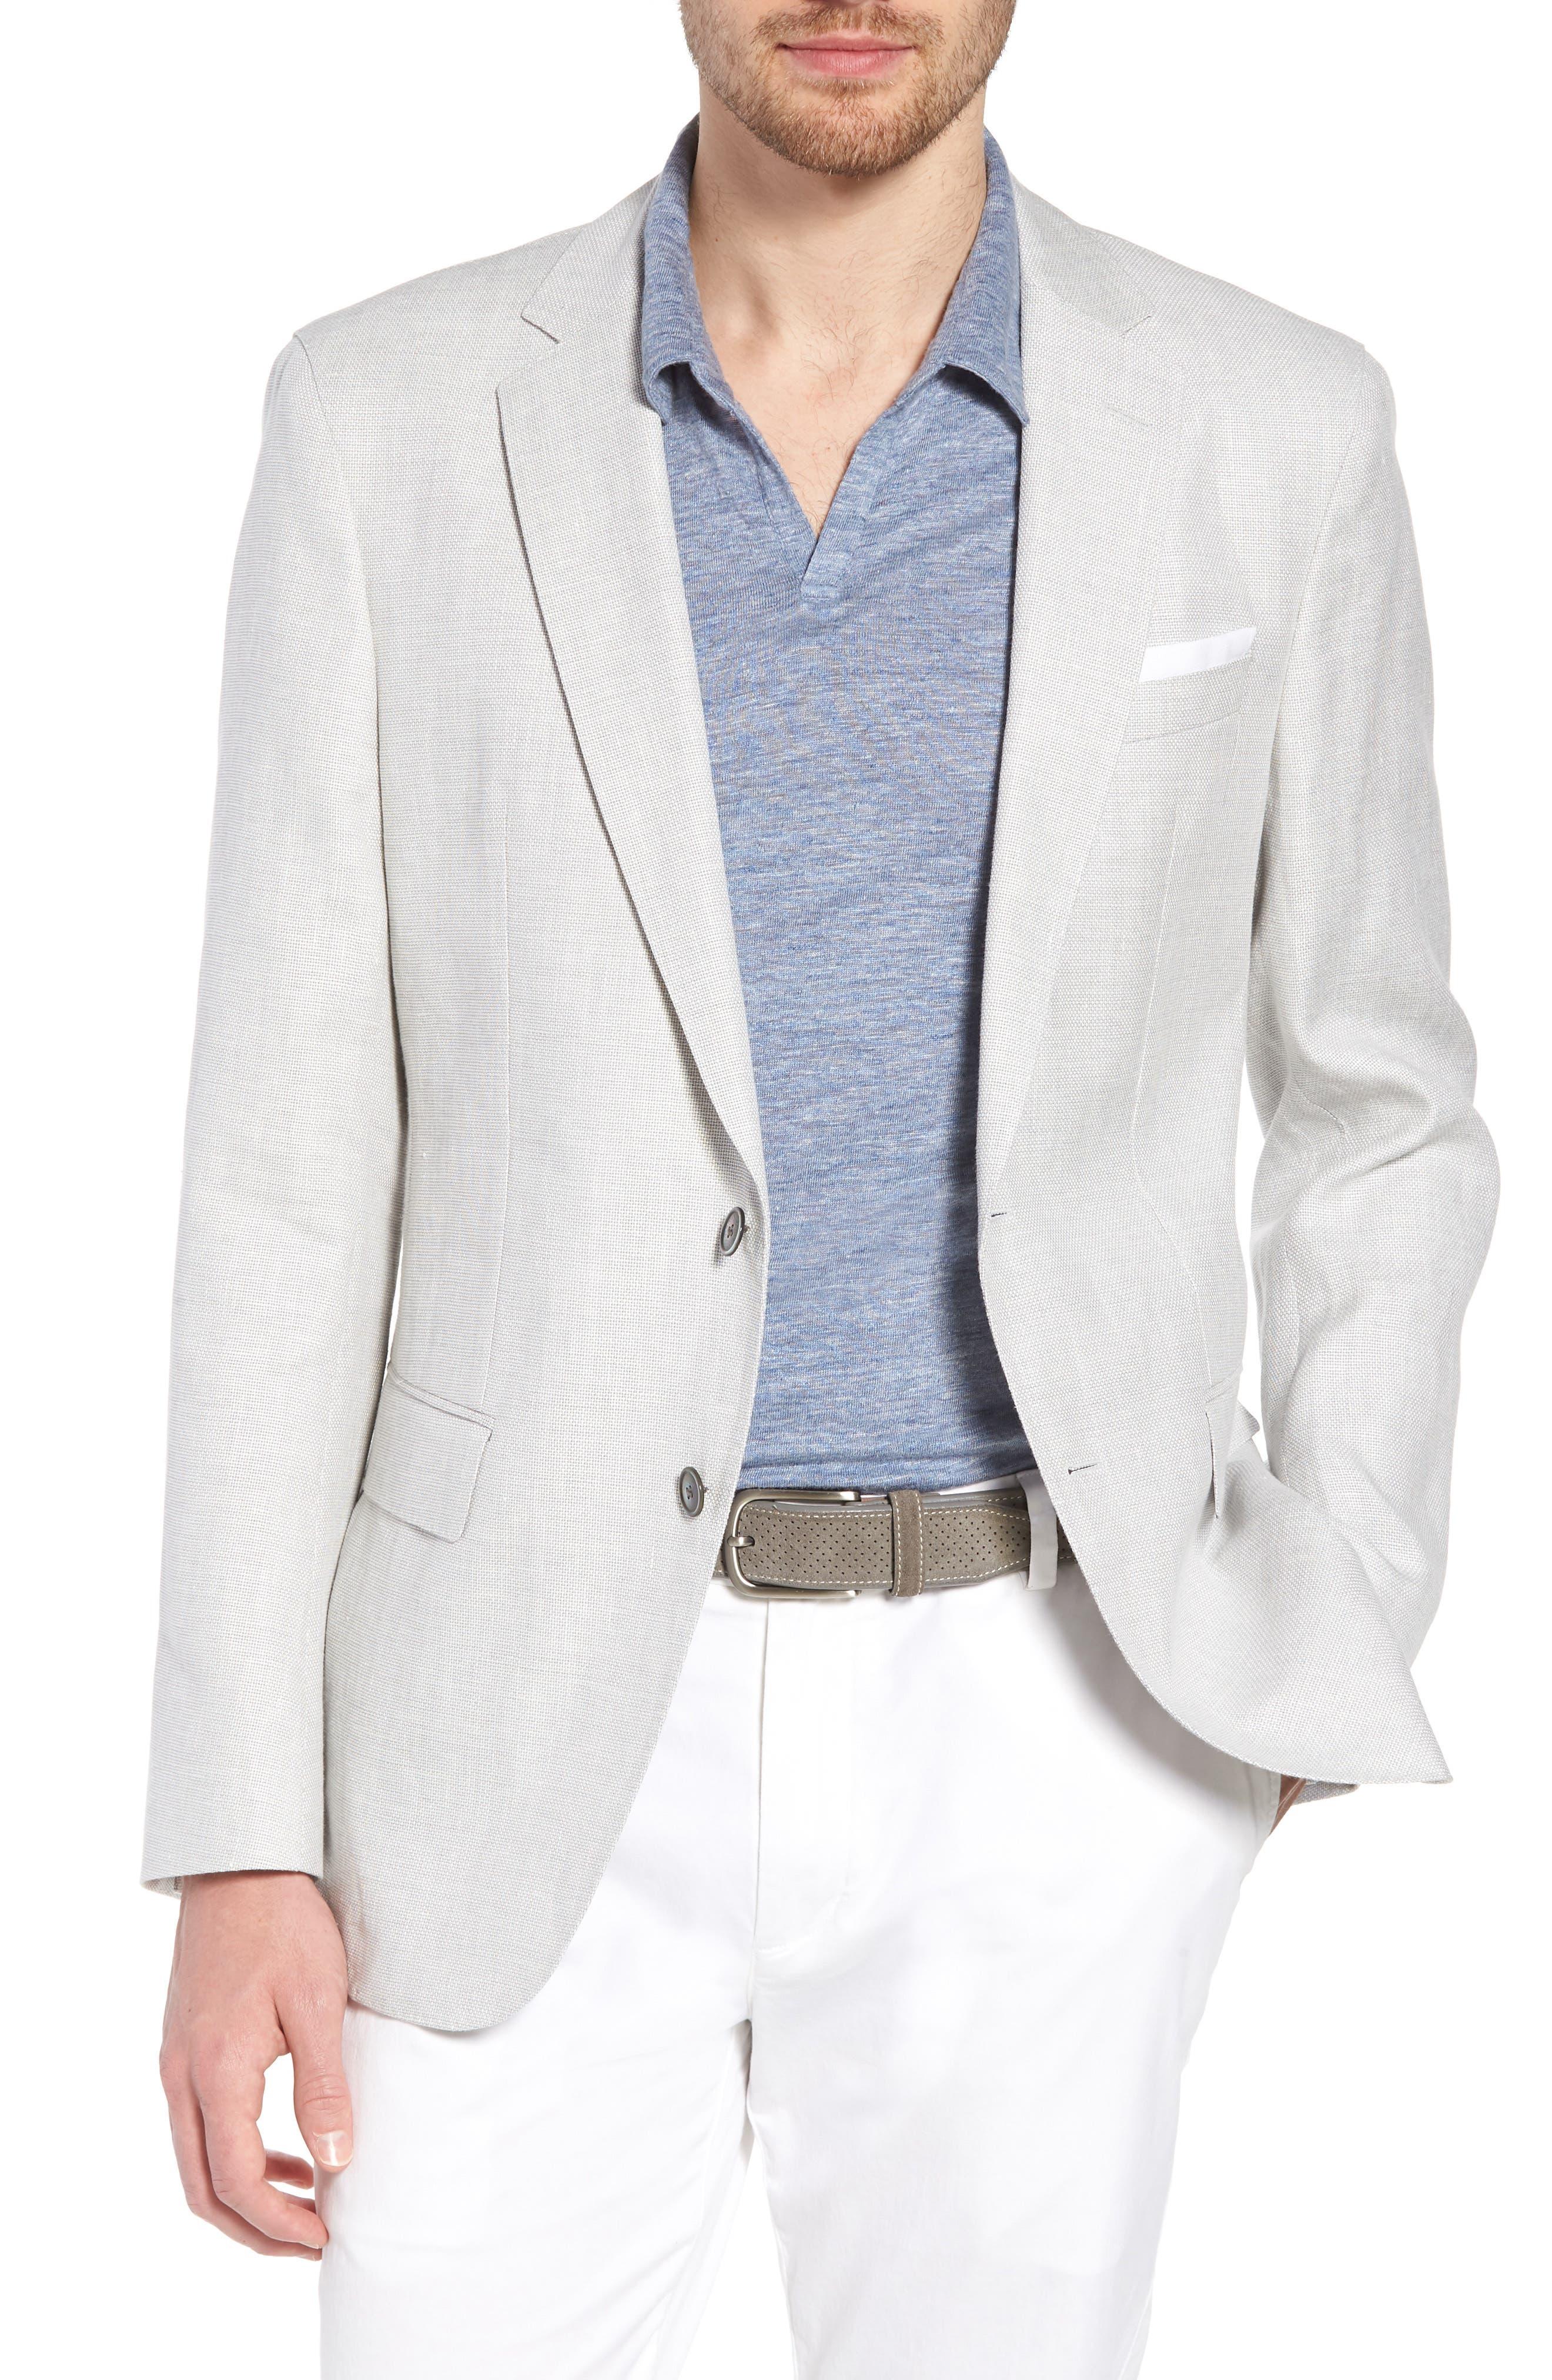 Hartlay Trim Fit Linen Blend Blazer,                         Main,                         color, 020